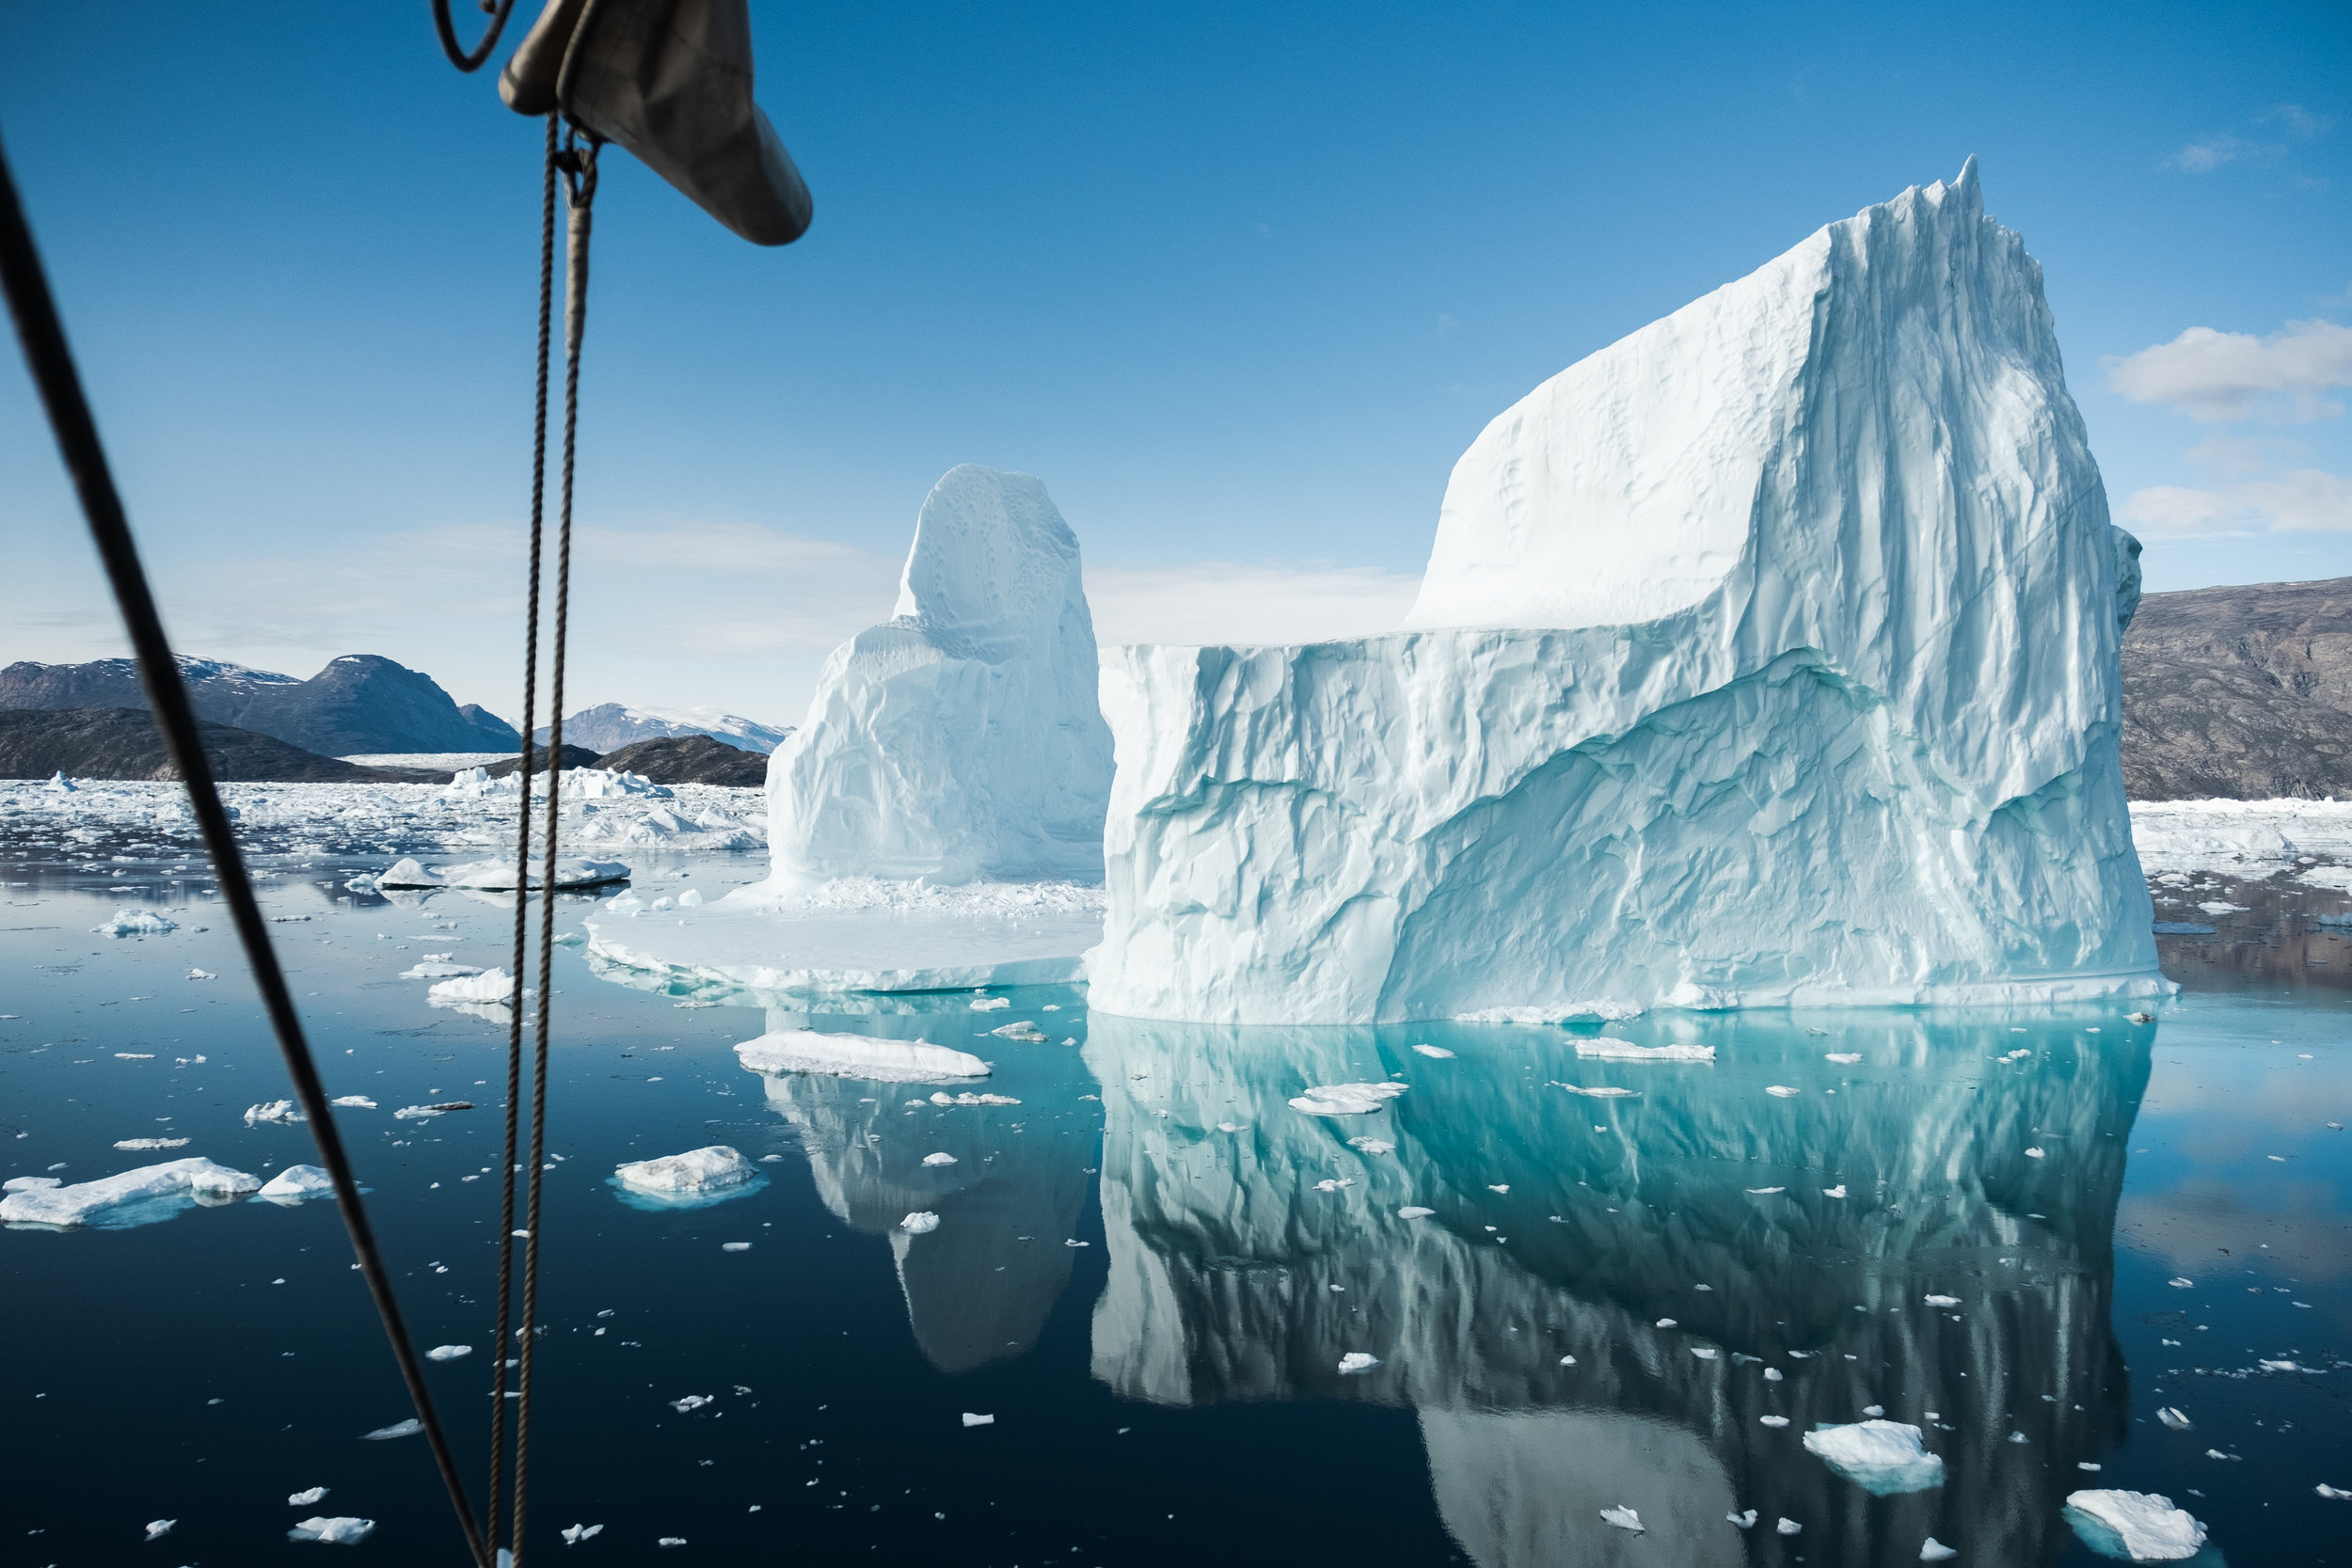 benjamin-hardman-iceland-DSCF8879.jpg